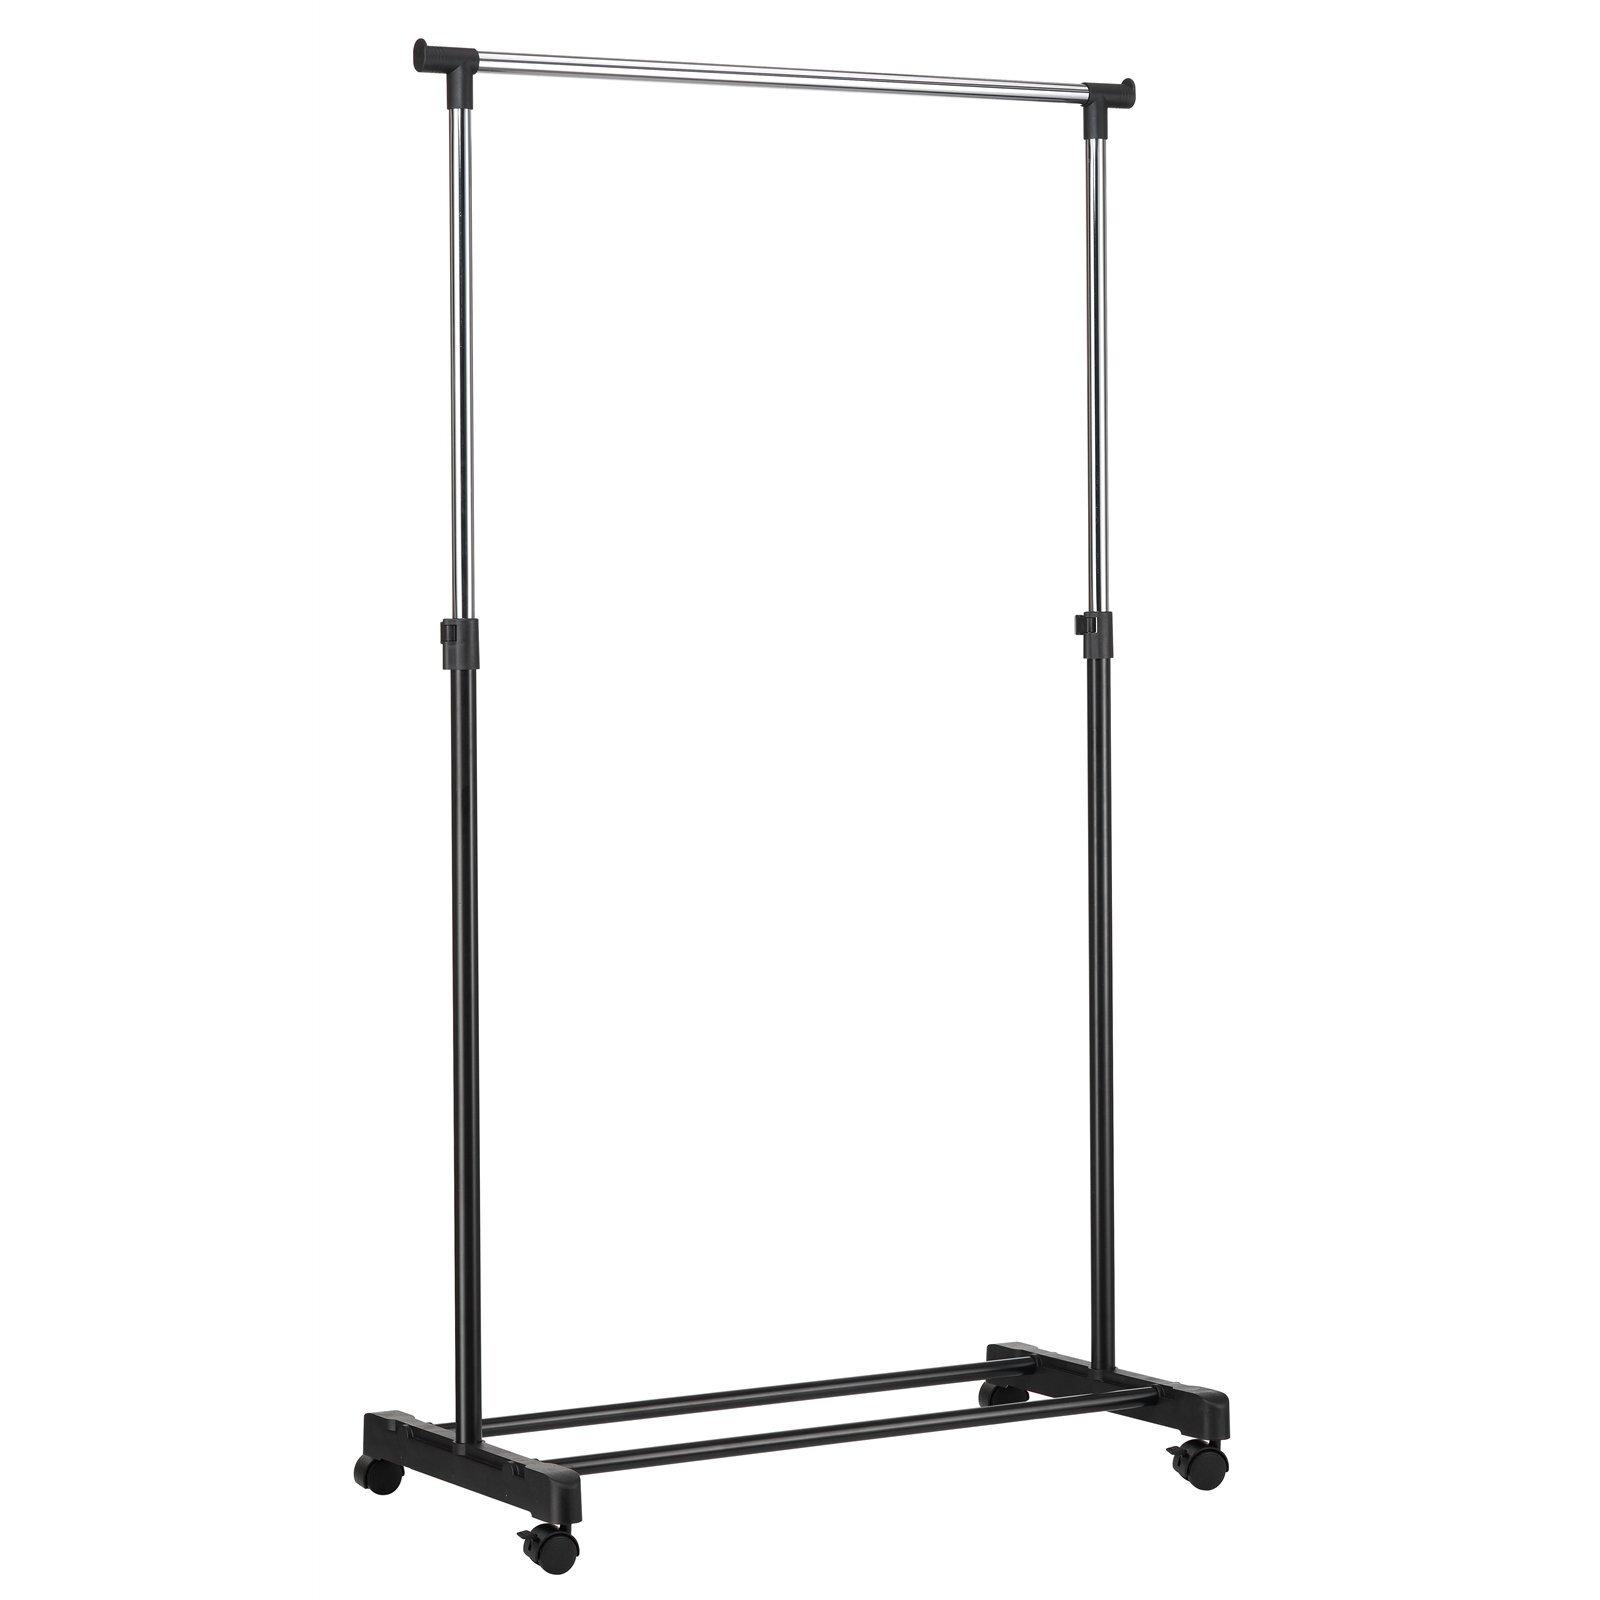 All Set 84 x 41.5 x 101-167cm Single Bar Adjustable Height Garment Rack